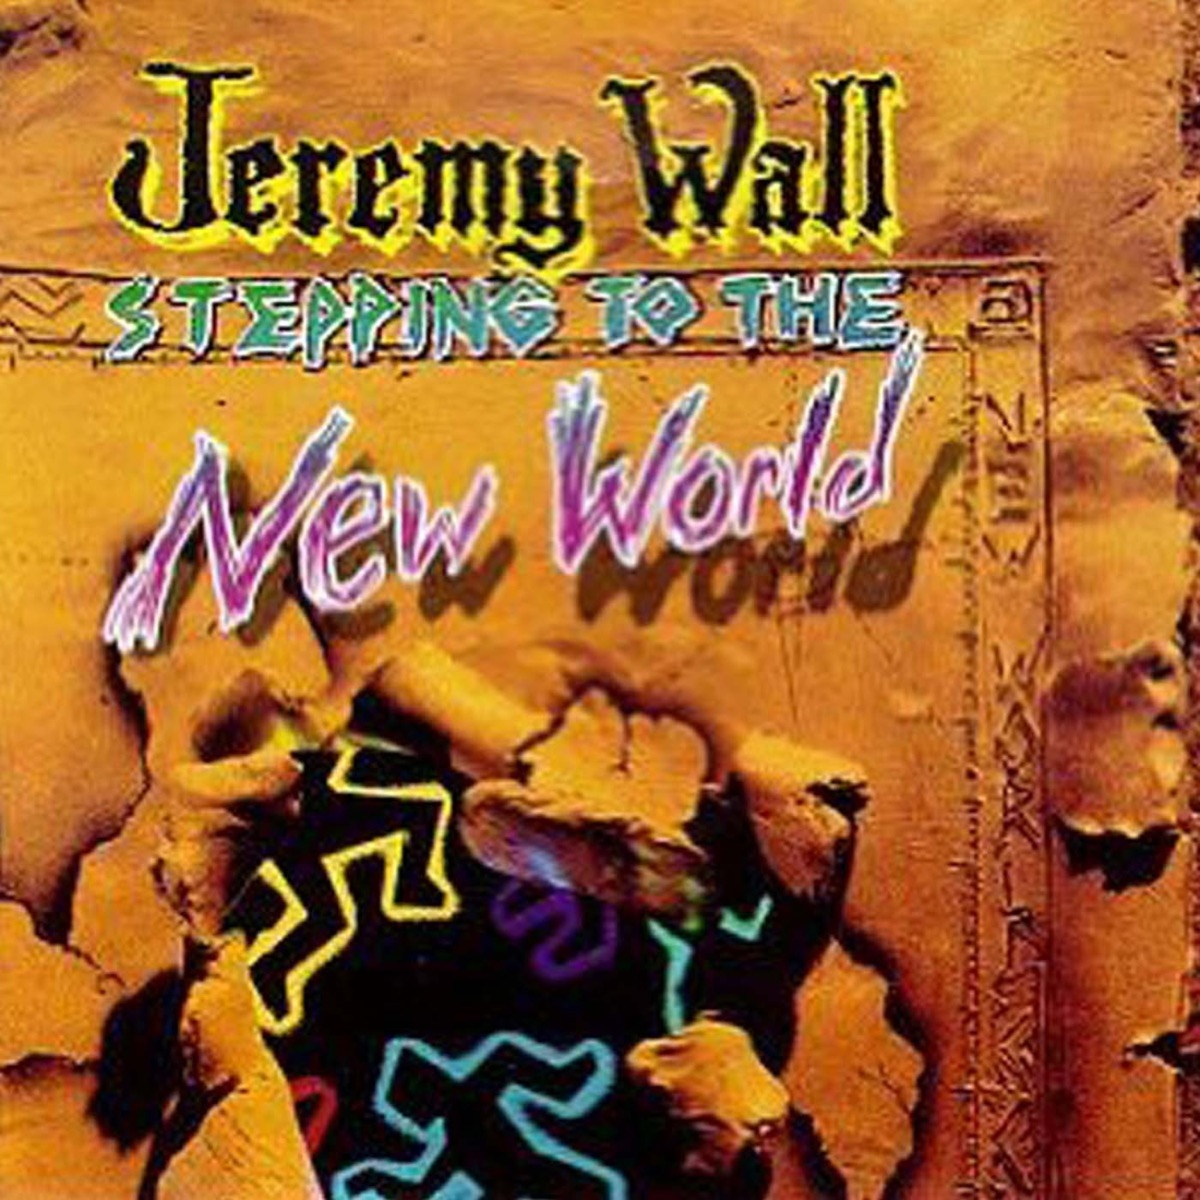 Jeremy Wall